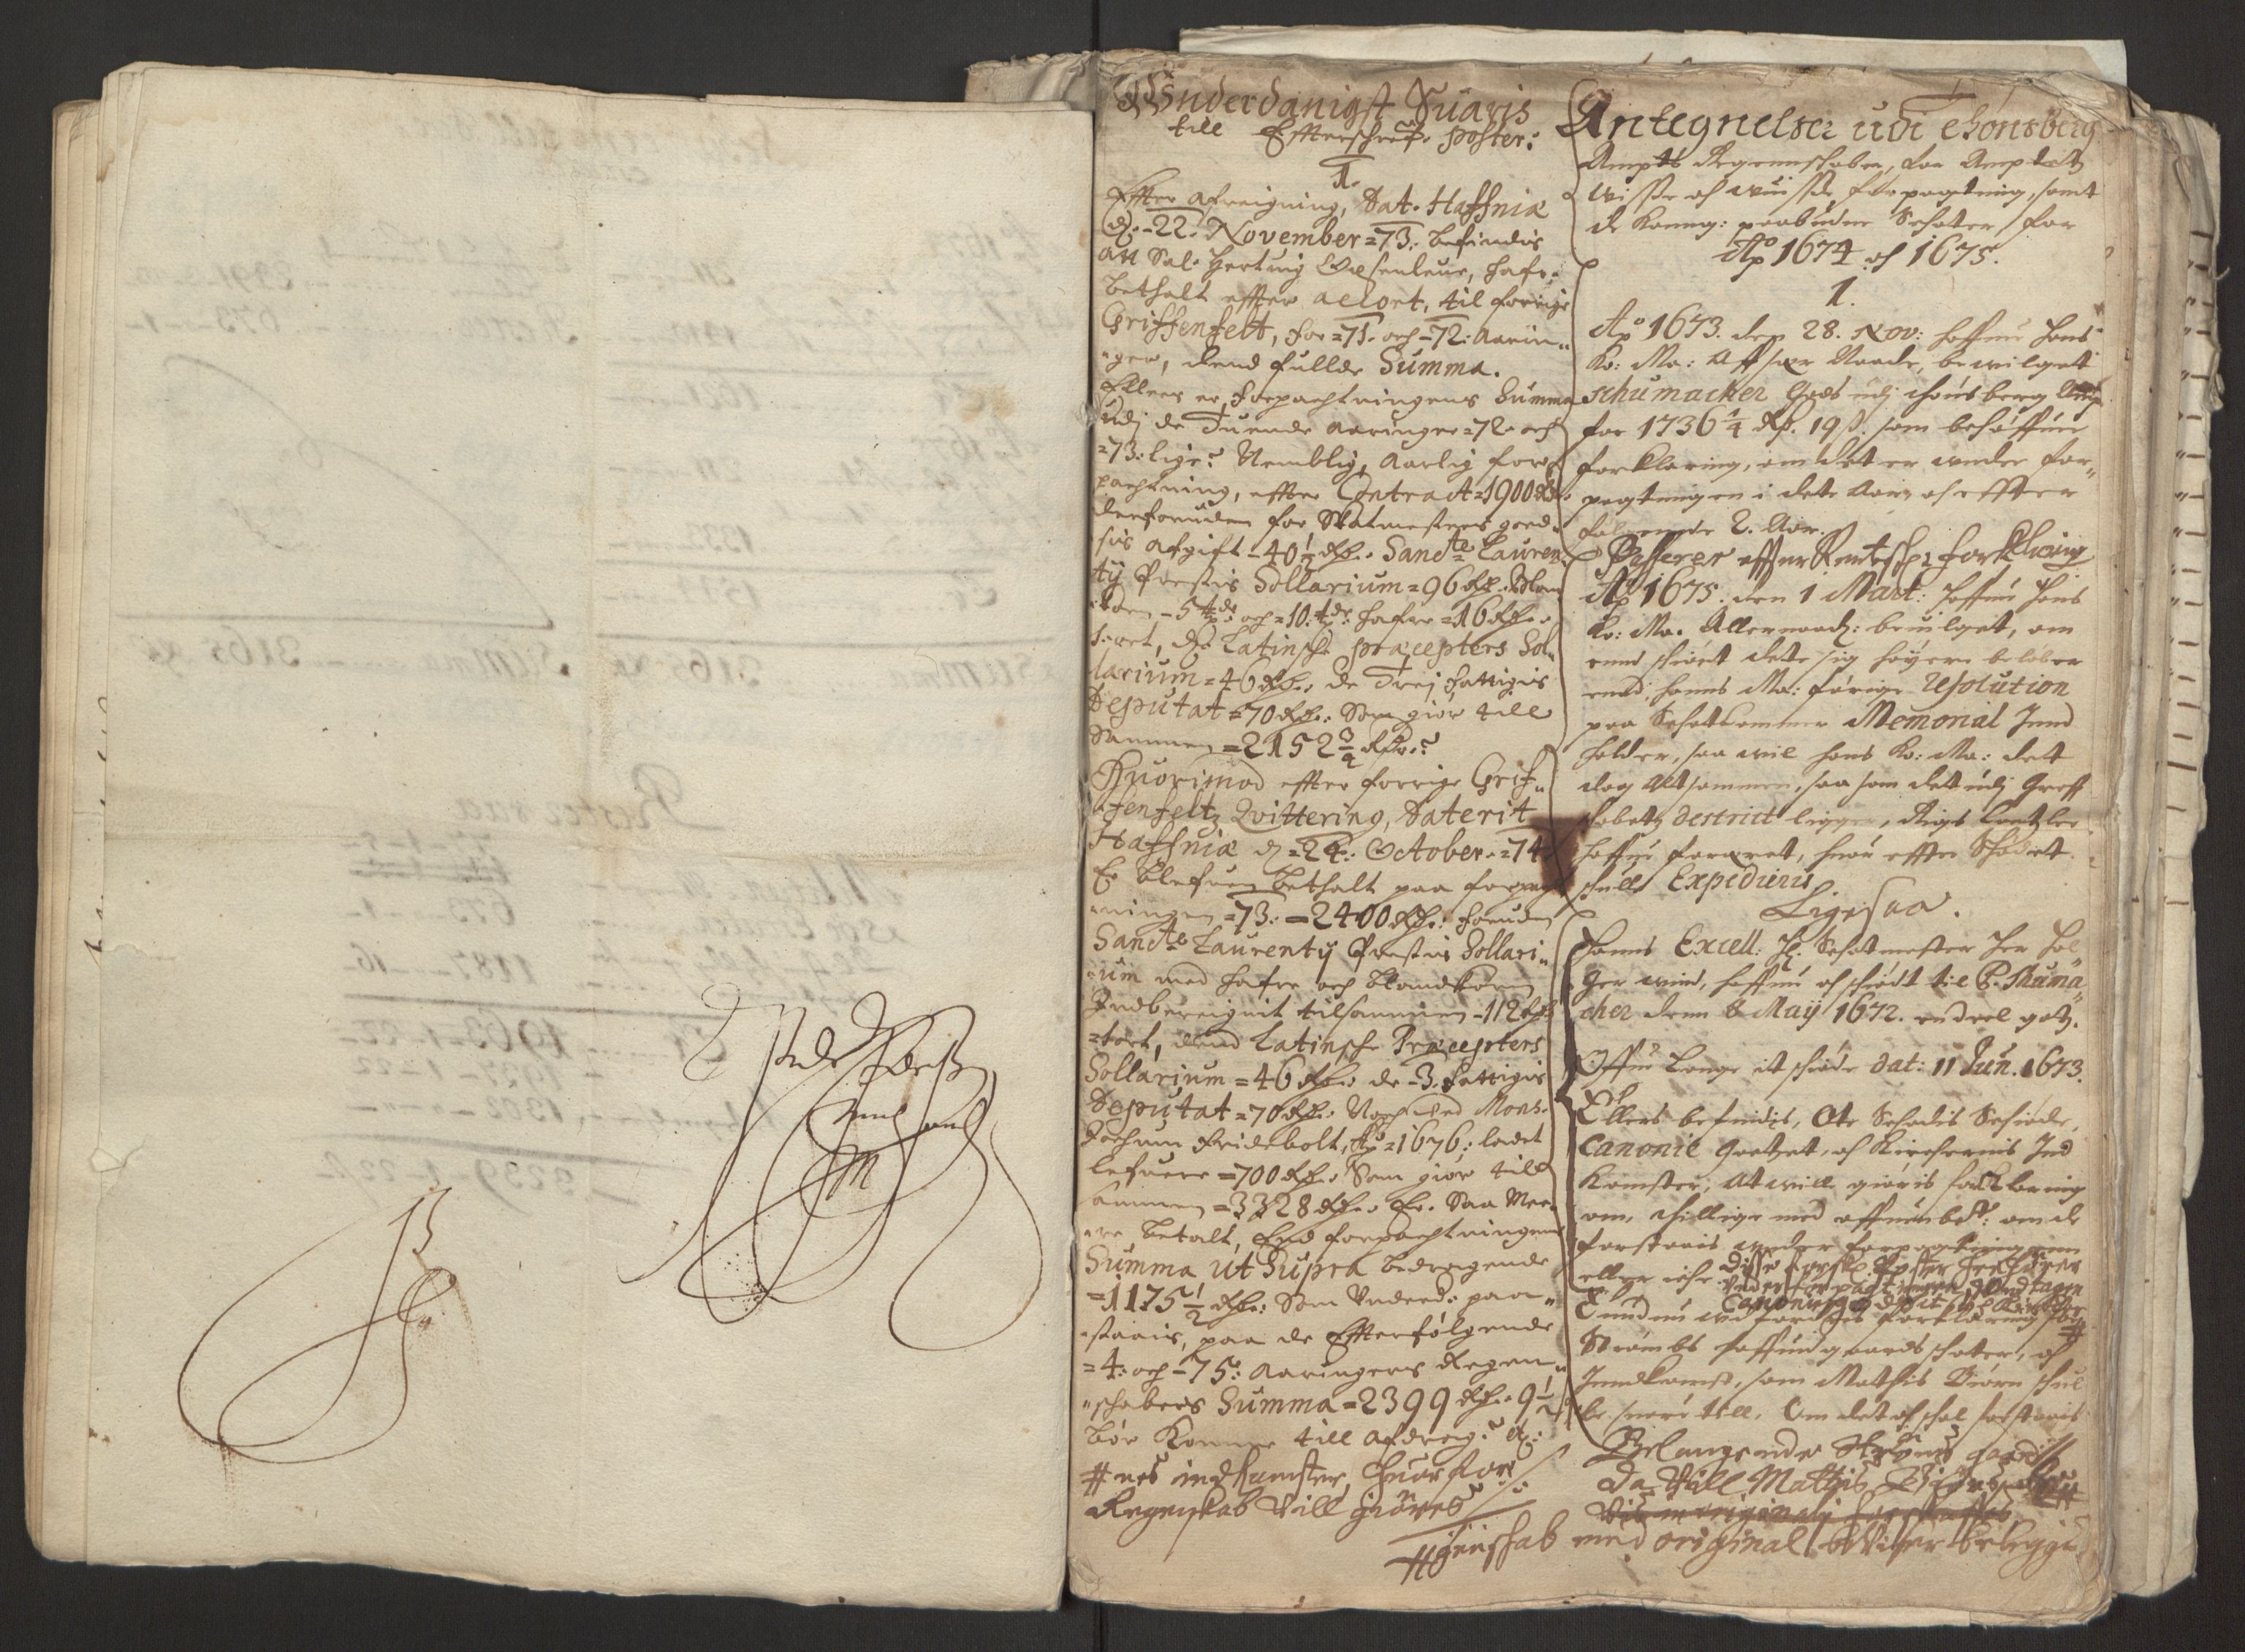 RA, Rentekammeret inntil 1814, Reviderte regnskaper, Fogderegnskap, R32/L1843: Fogderegnskap Jarlsberg grevskap, 1674-1675, s. 27